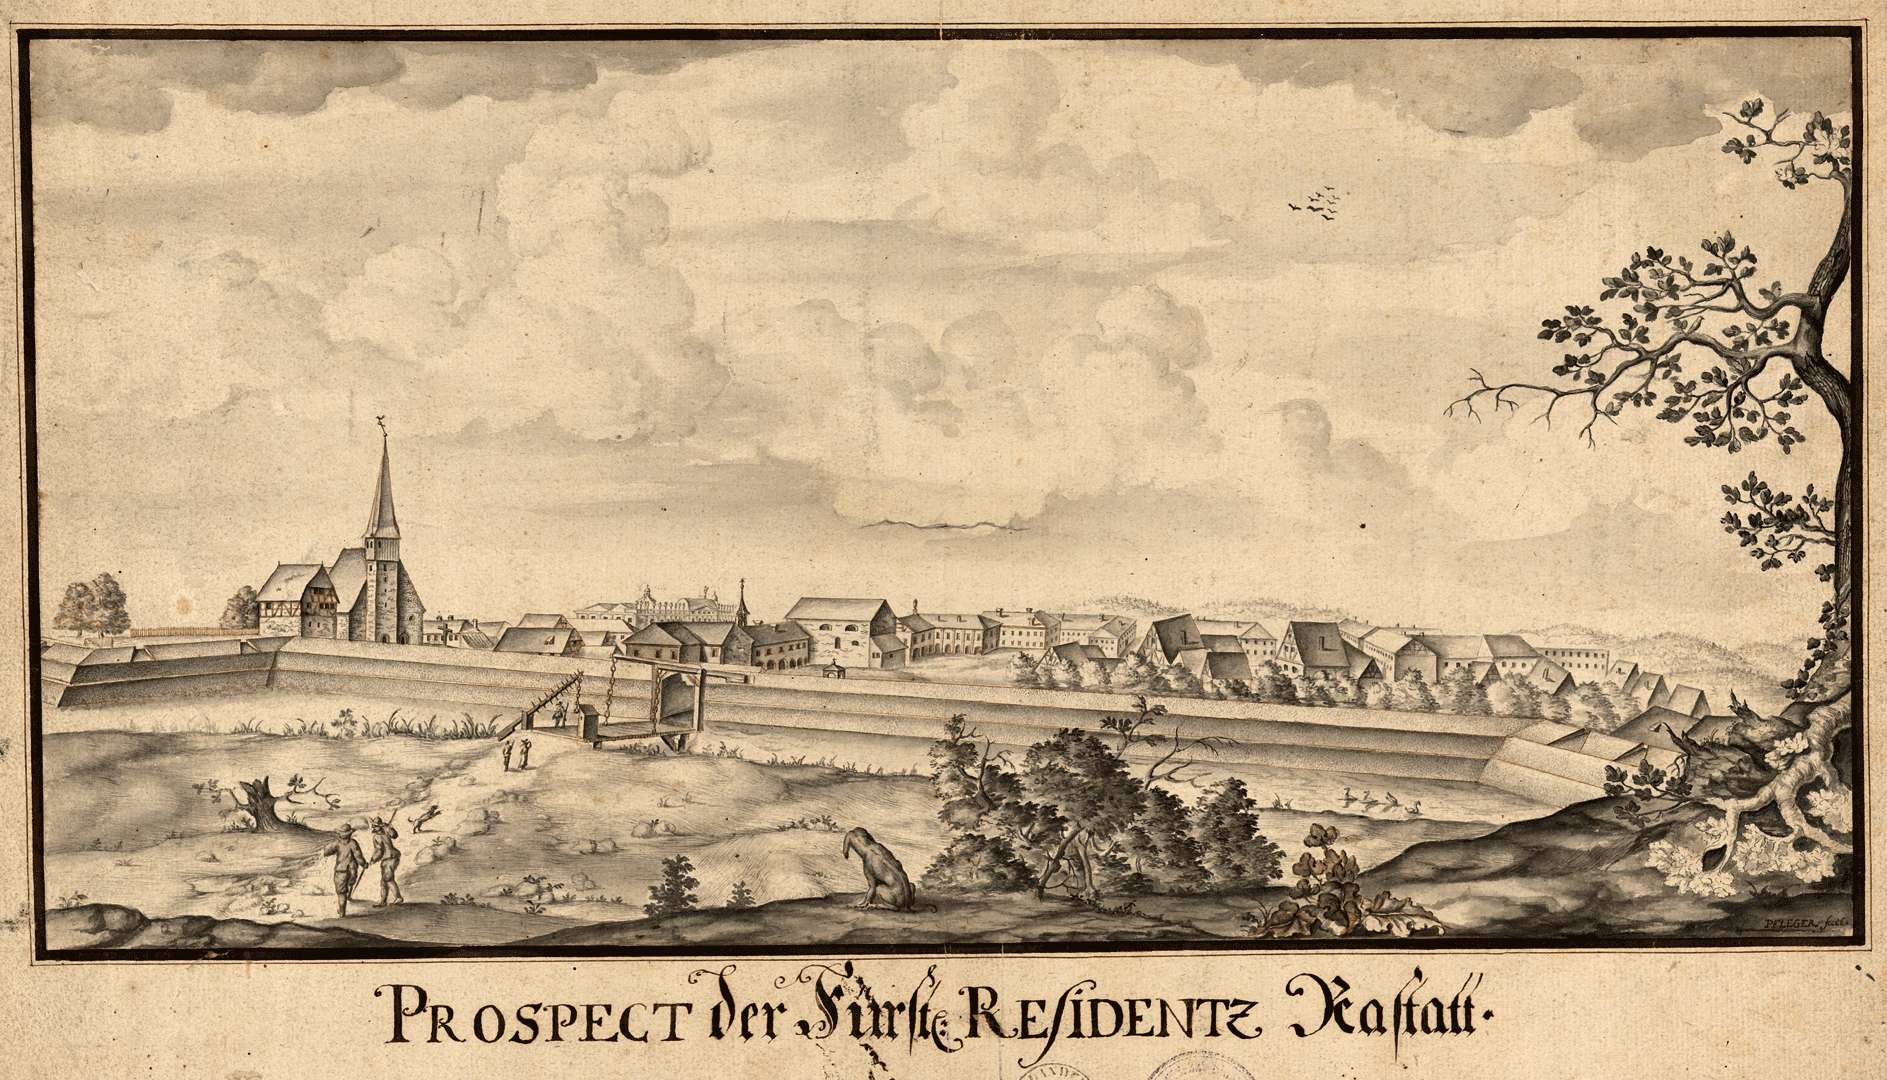 Prospect der Fürstl. Residenz Rastatt, Bild 1